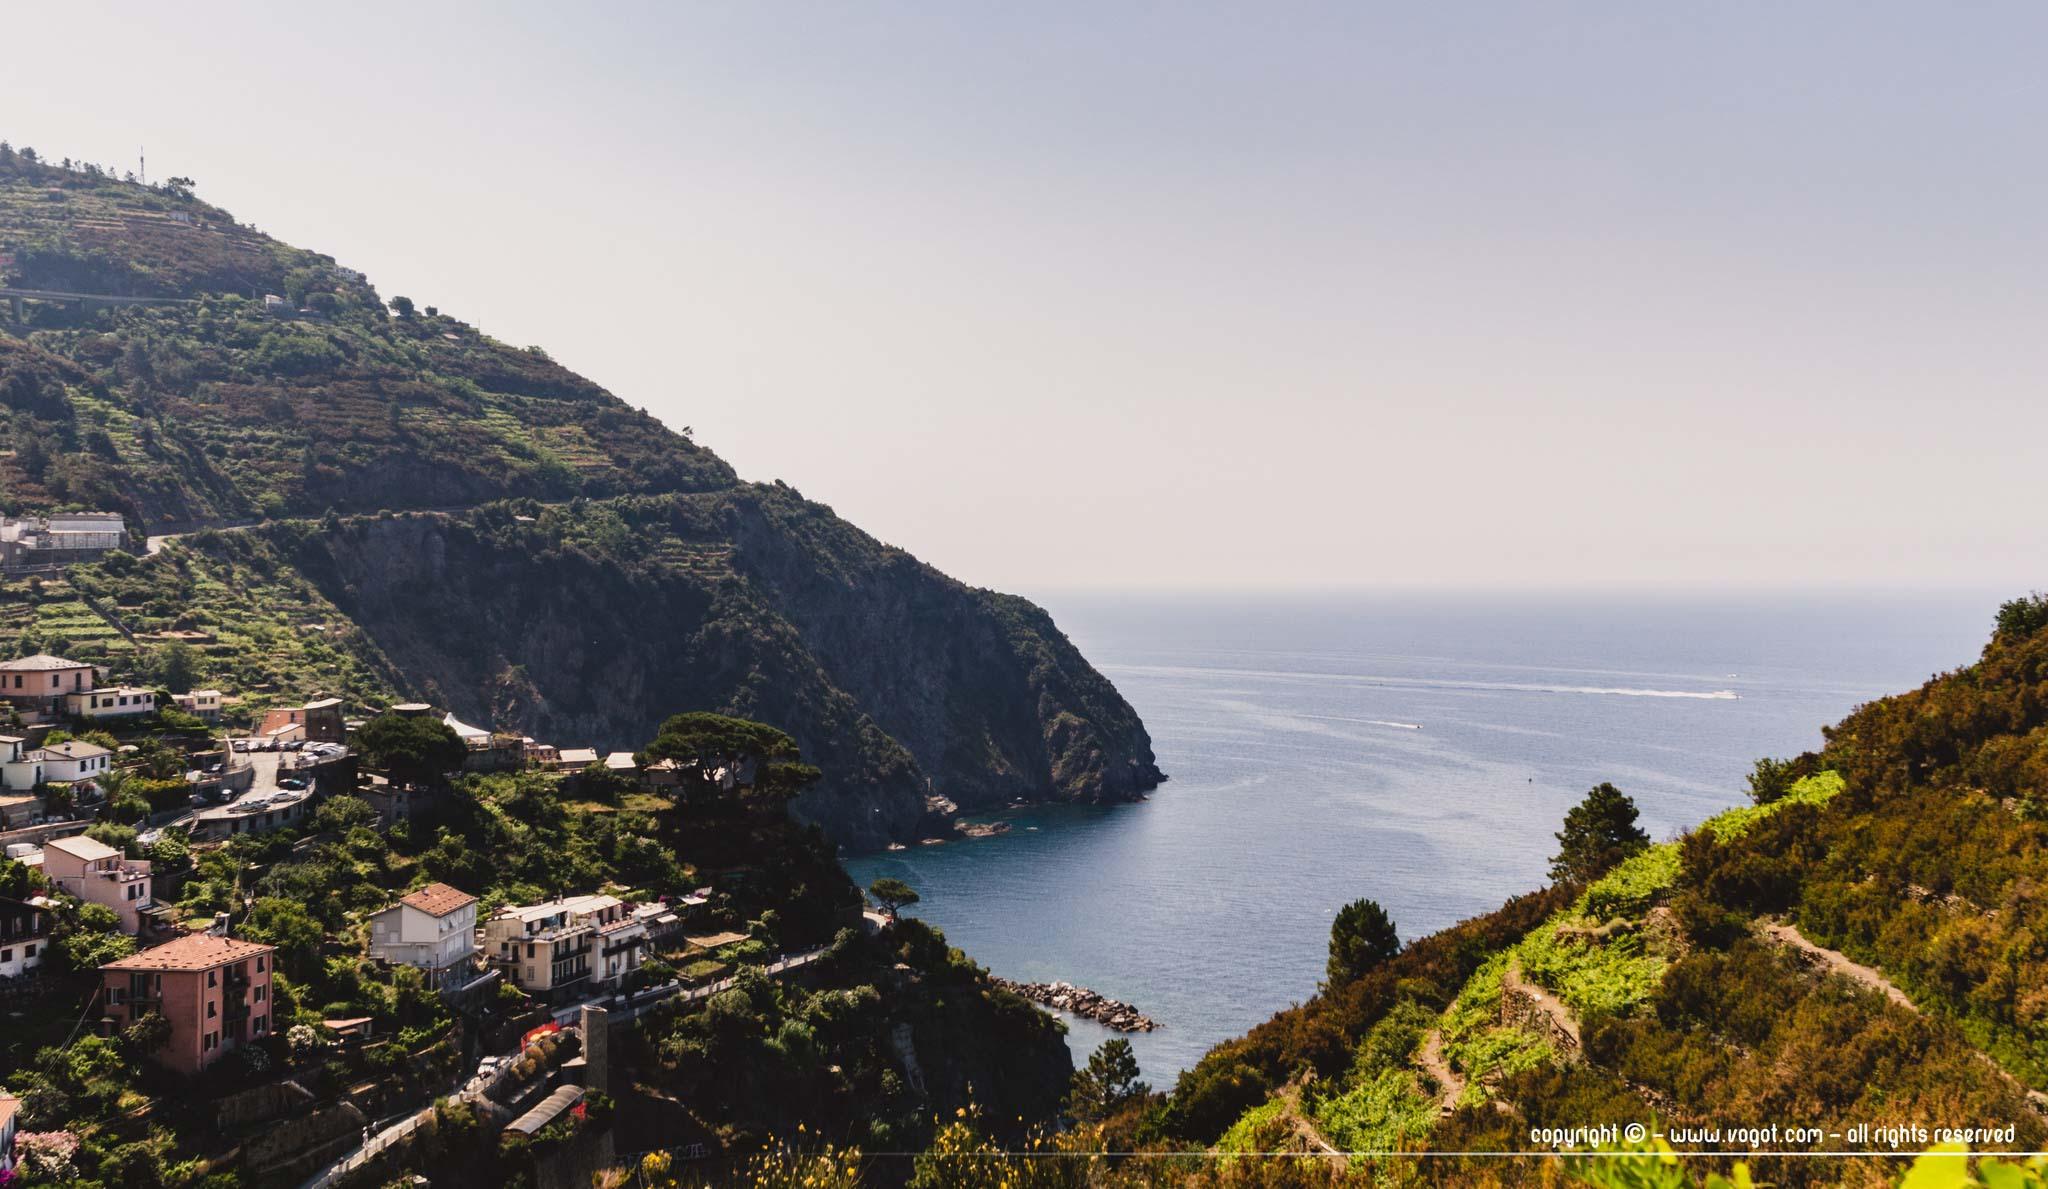 Cinque Terre à pied - panorama sur la Méditerranée entre Riomaggiore et Manarola